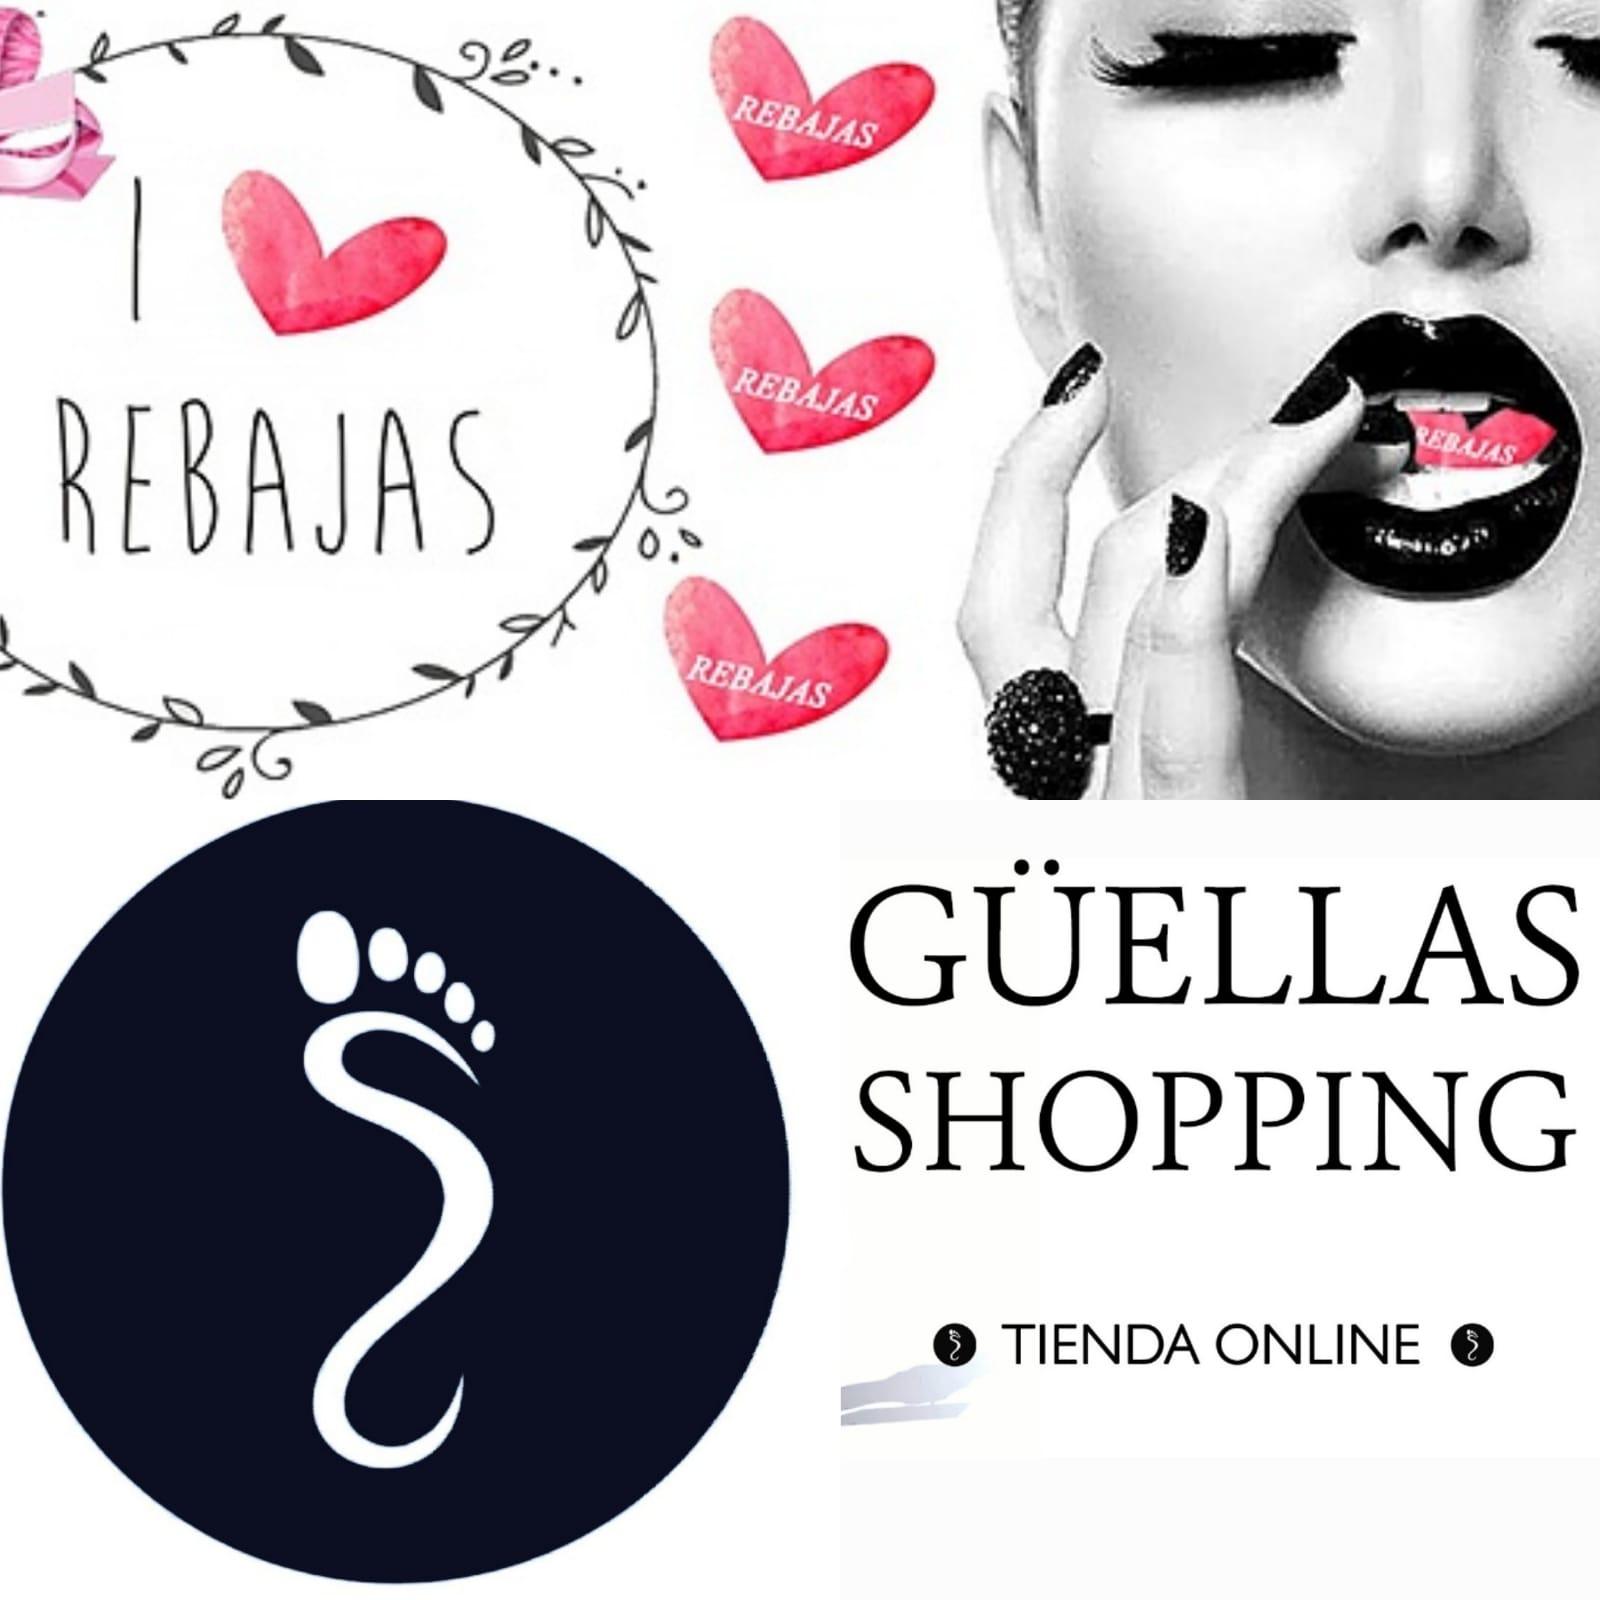 Güellas Shopping Rebajas